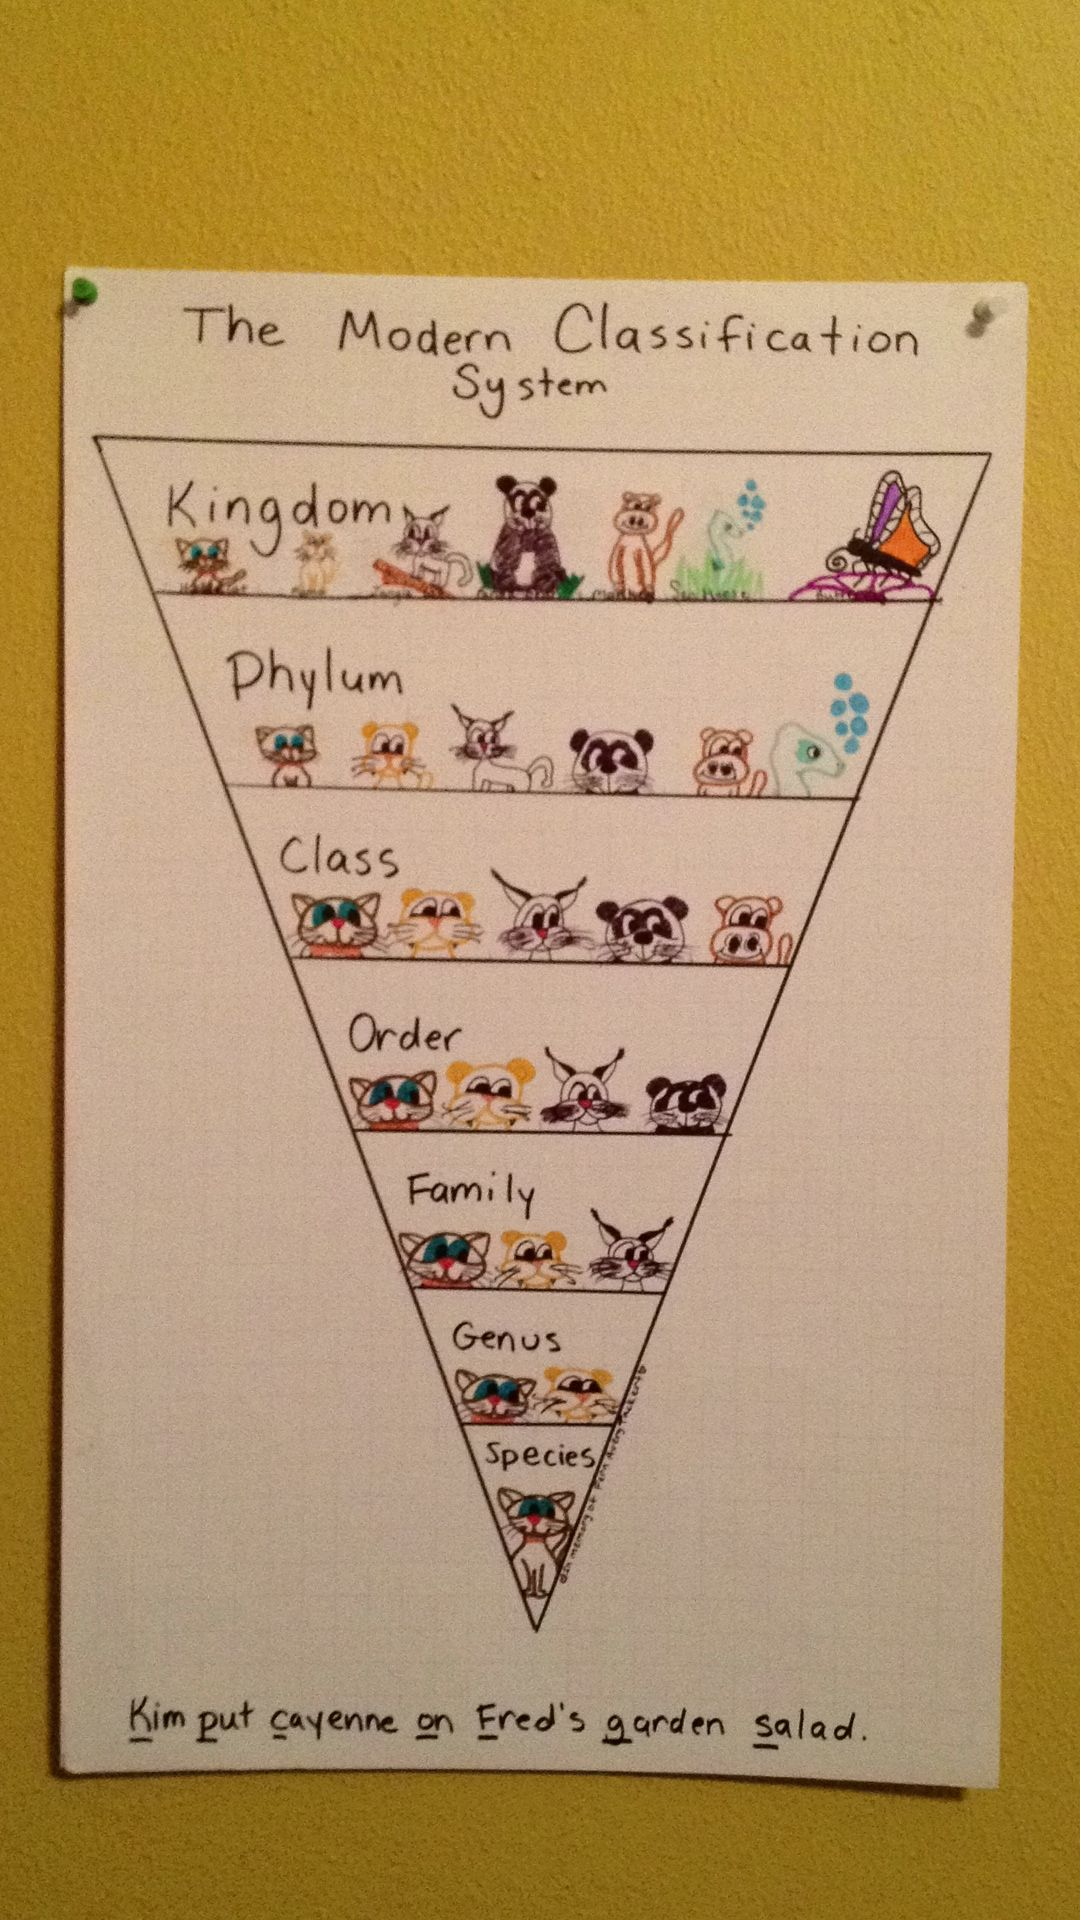 Modern Classification System